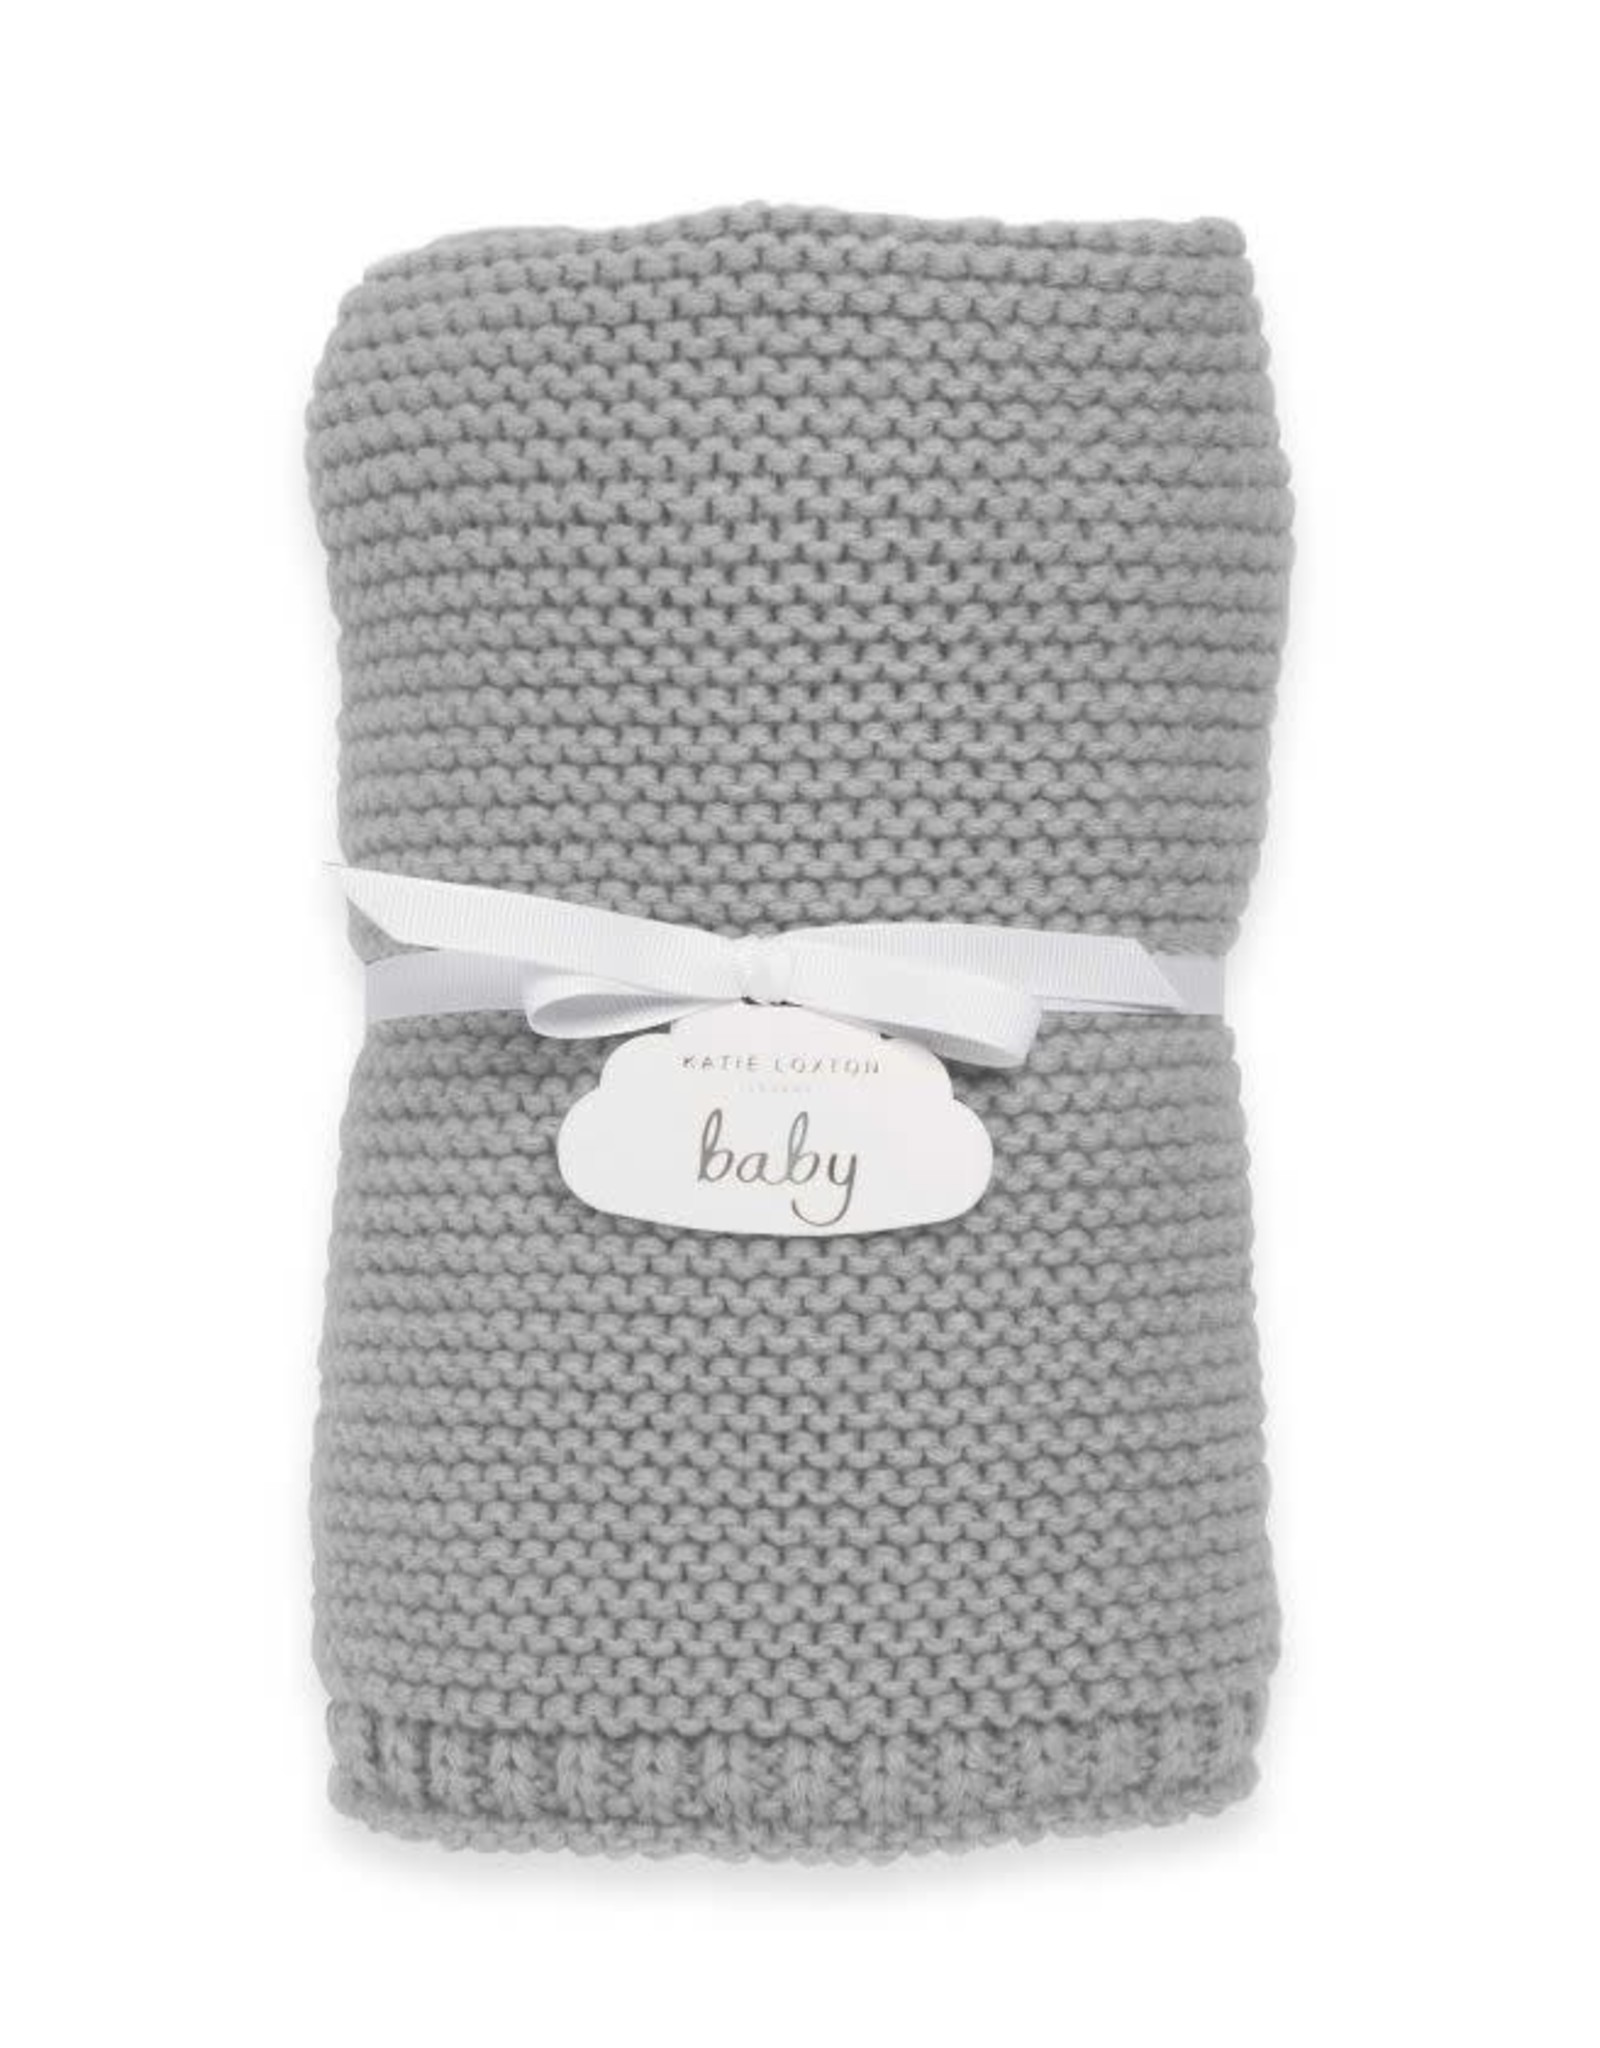 Katie Loxton Baby Blanket-Grey